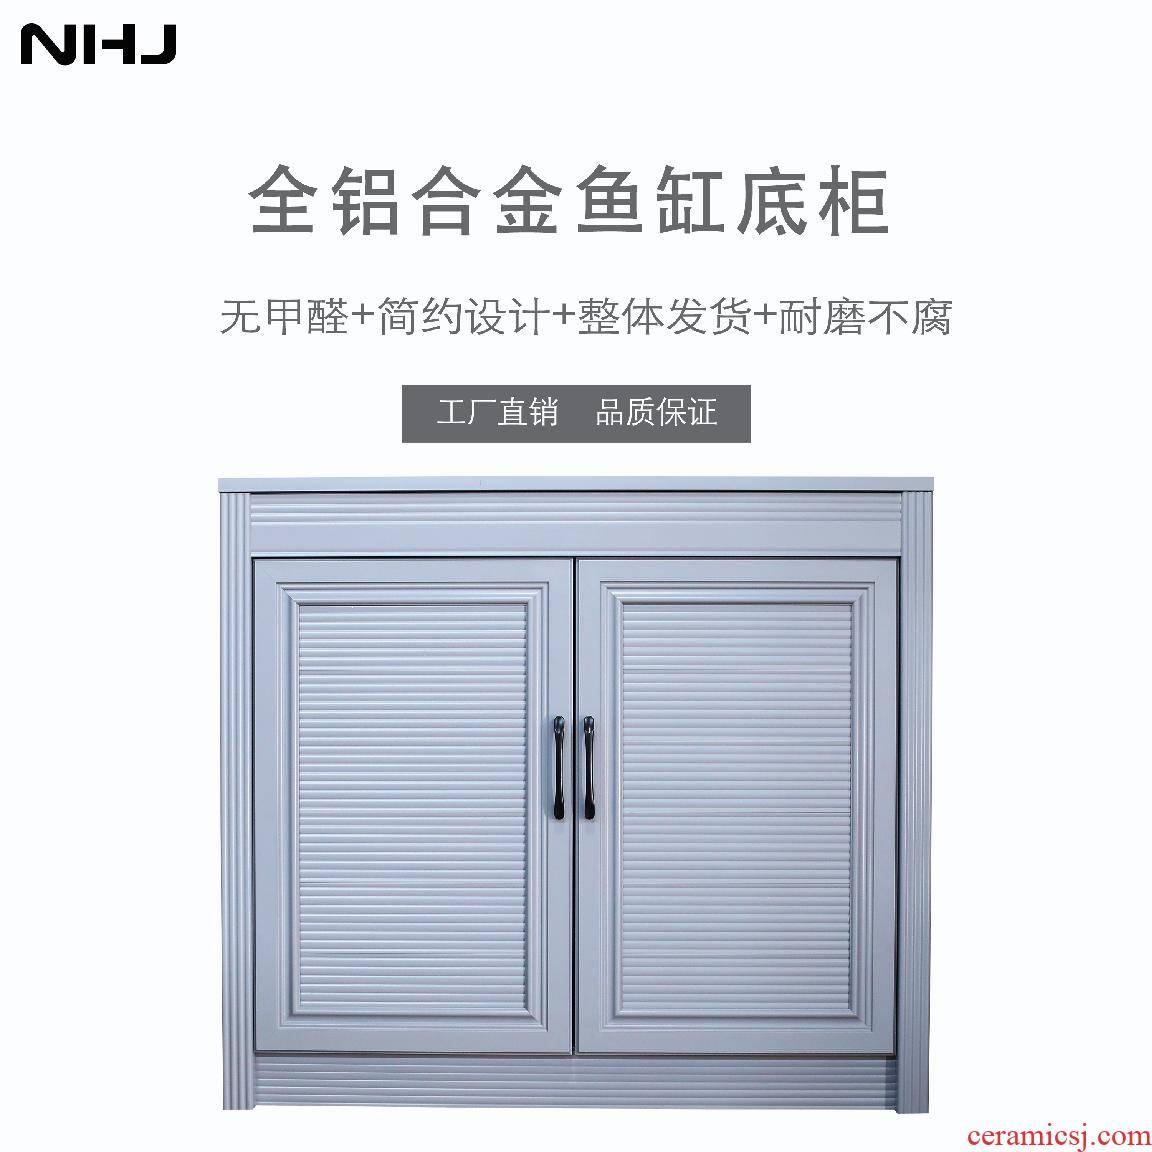 The Custom make new ultra cylinder bottom ark cabinet NHJ aquarium aquarium bottom ark, aluminum alloy hanjiang river aquatic cylinder ground ark base